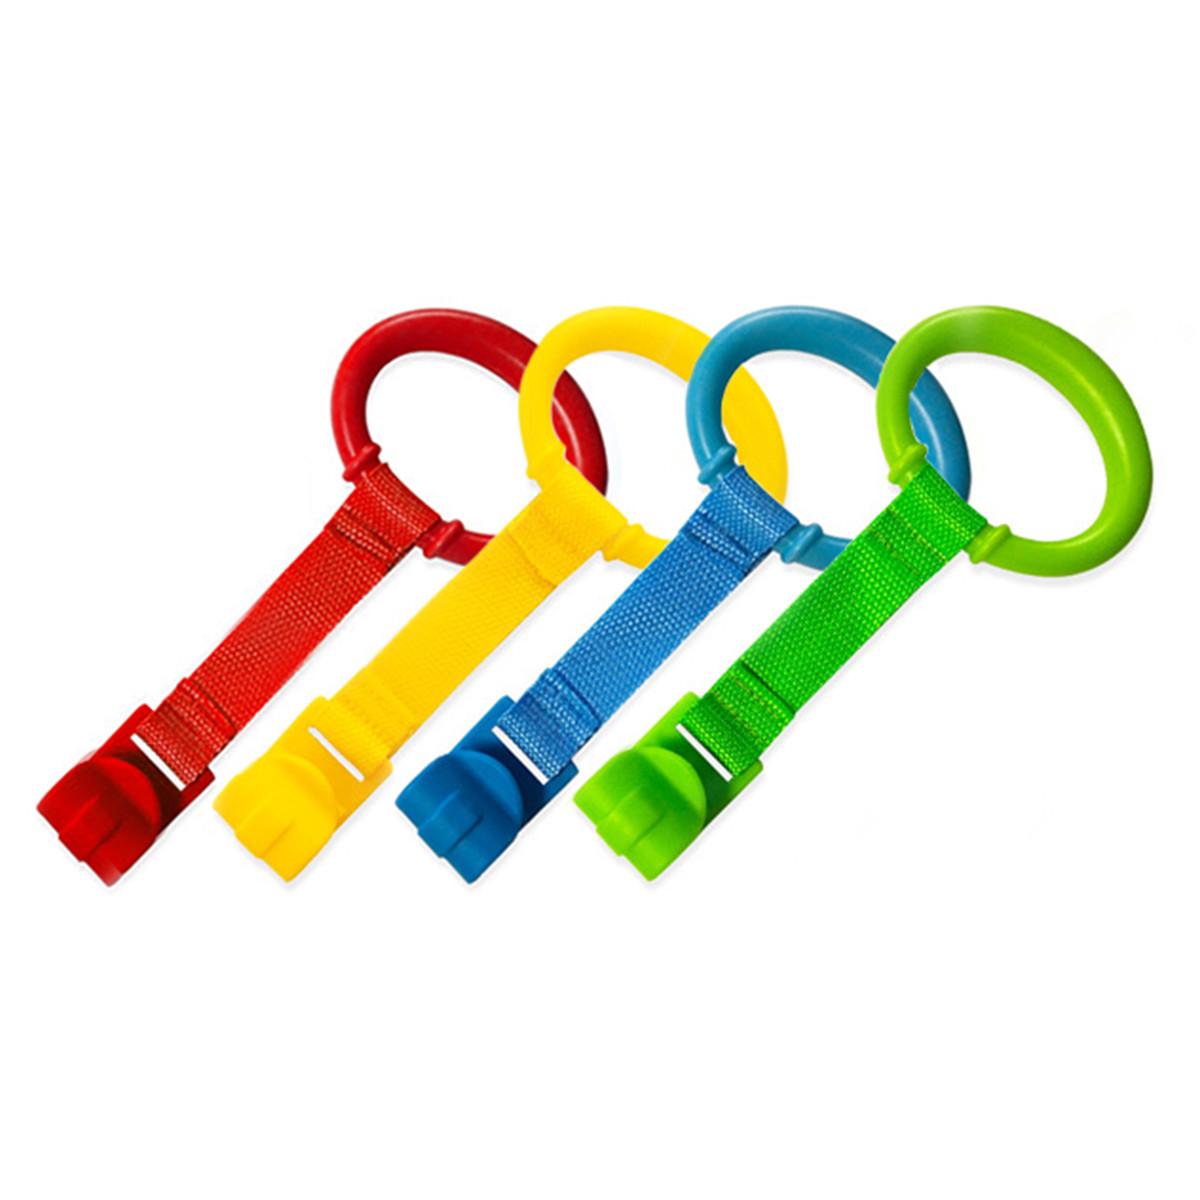 Кільця для манежу Kinder Rich (Ring Max) 4 шт